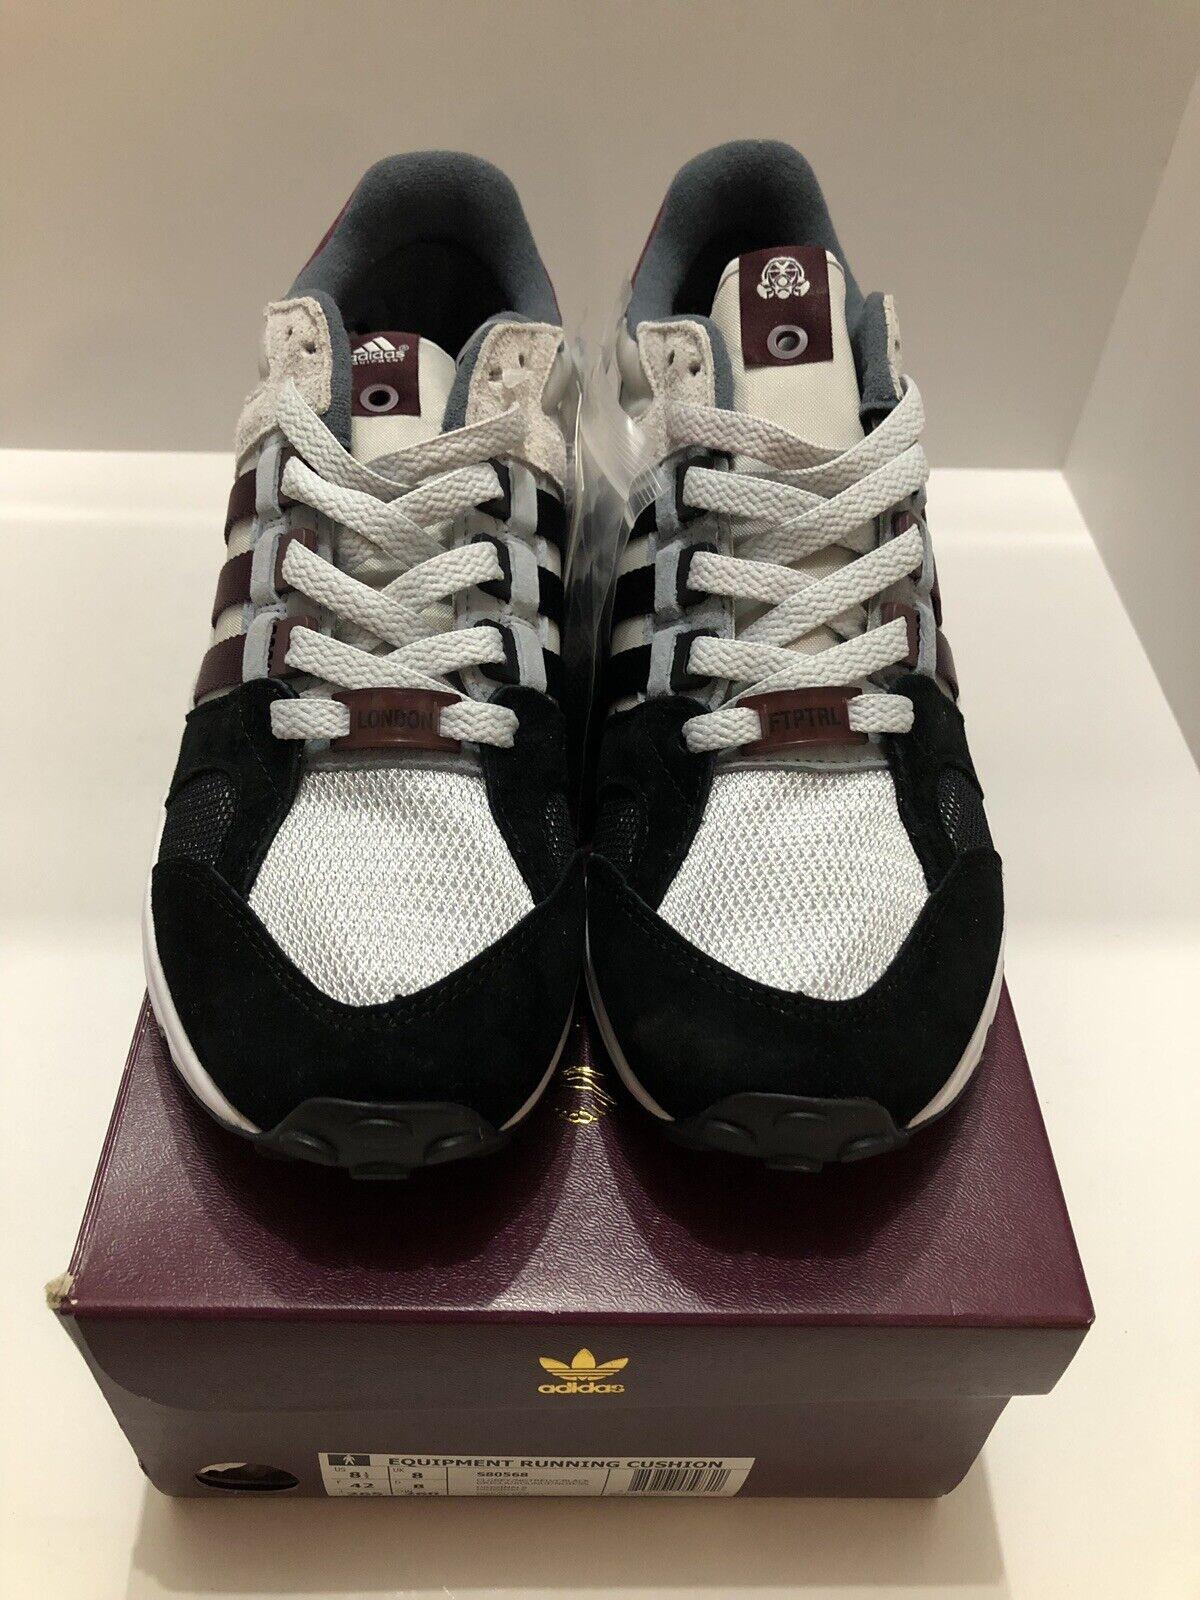 Adidas Consortium x Footpatrol Equipment Running Cushion - S80568-Men's Size 8.5